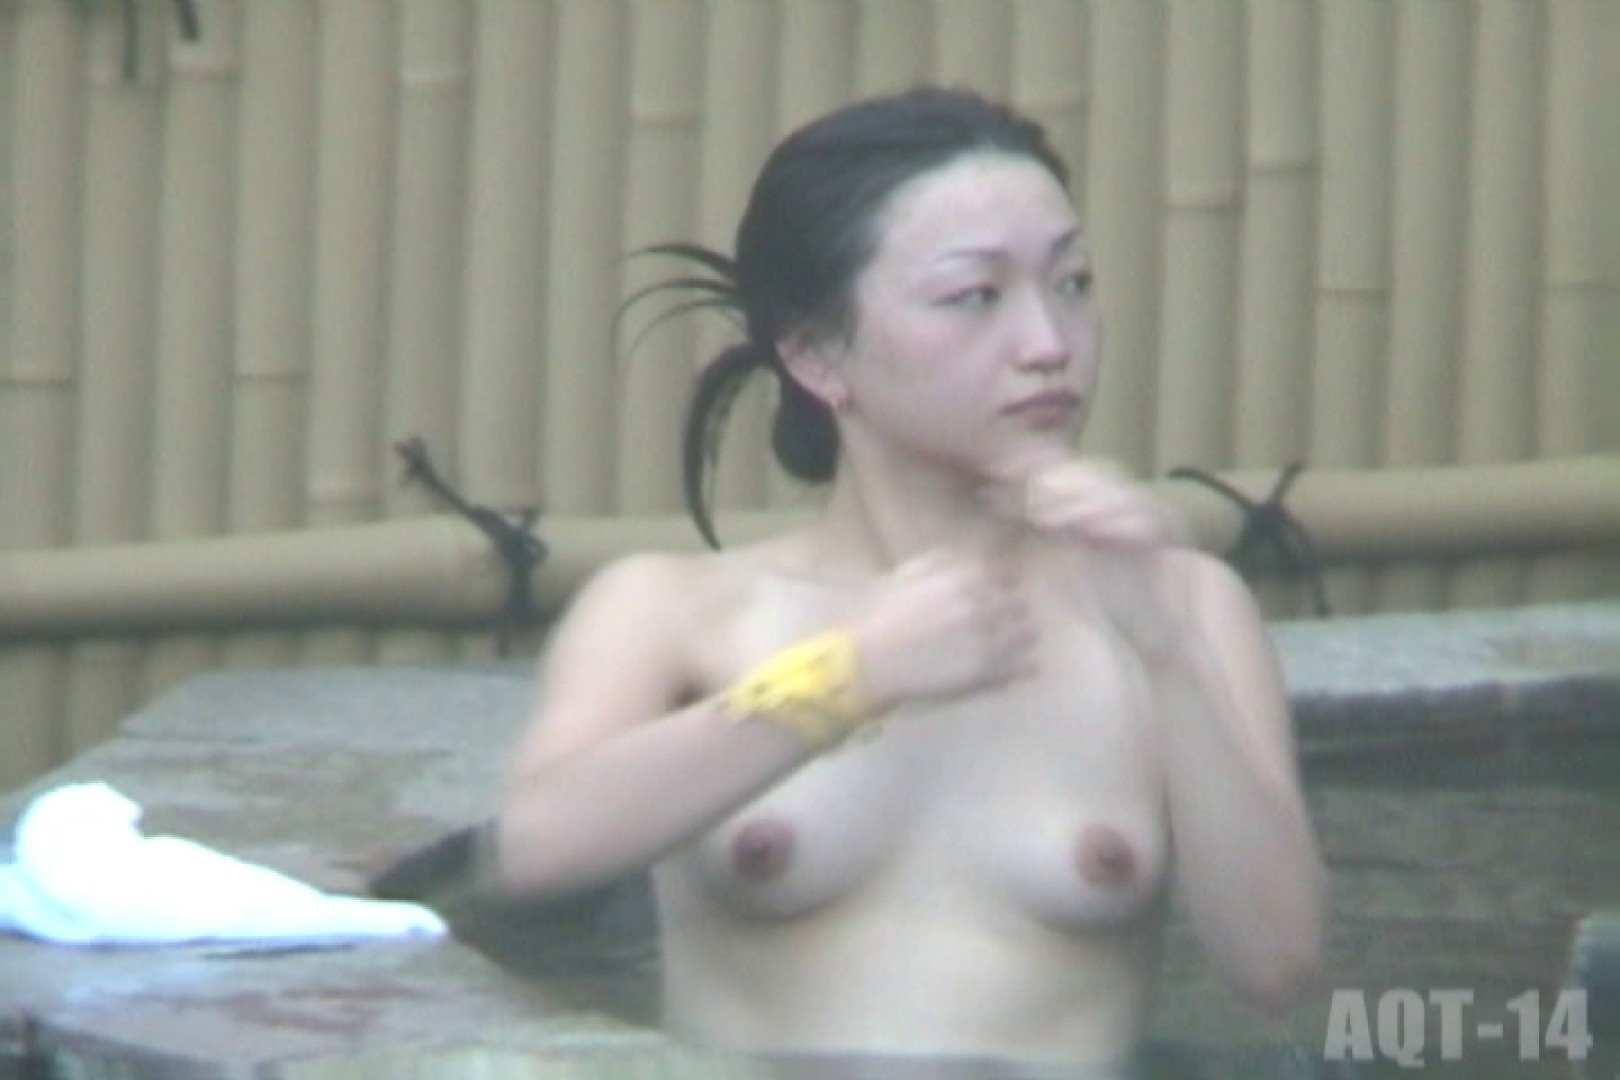 Aquaな露天風呂Vol.826 盗撮 | OLエロ画像  88PICs 55